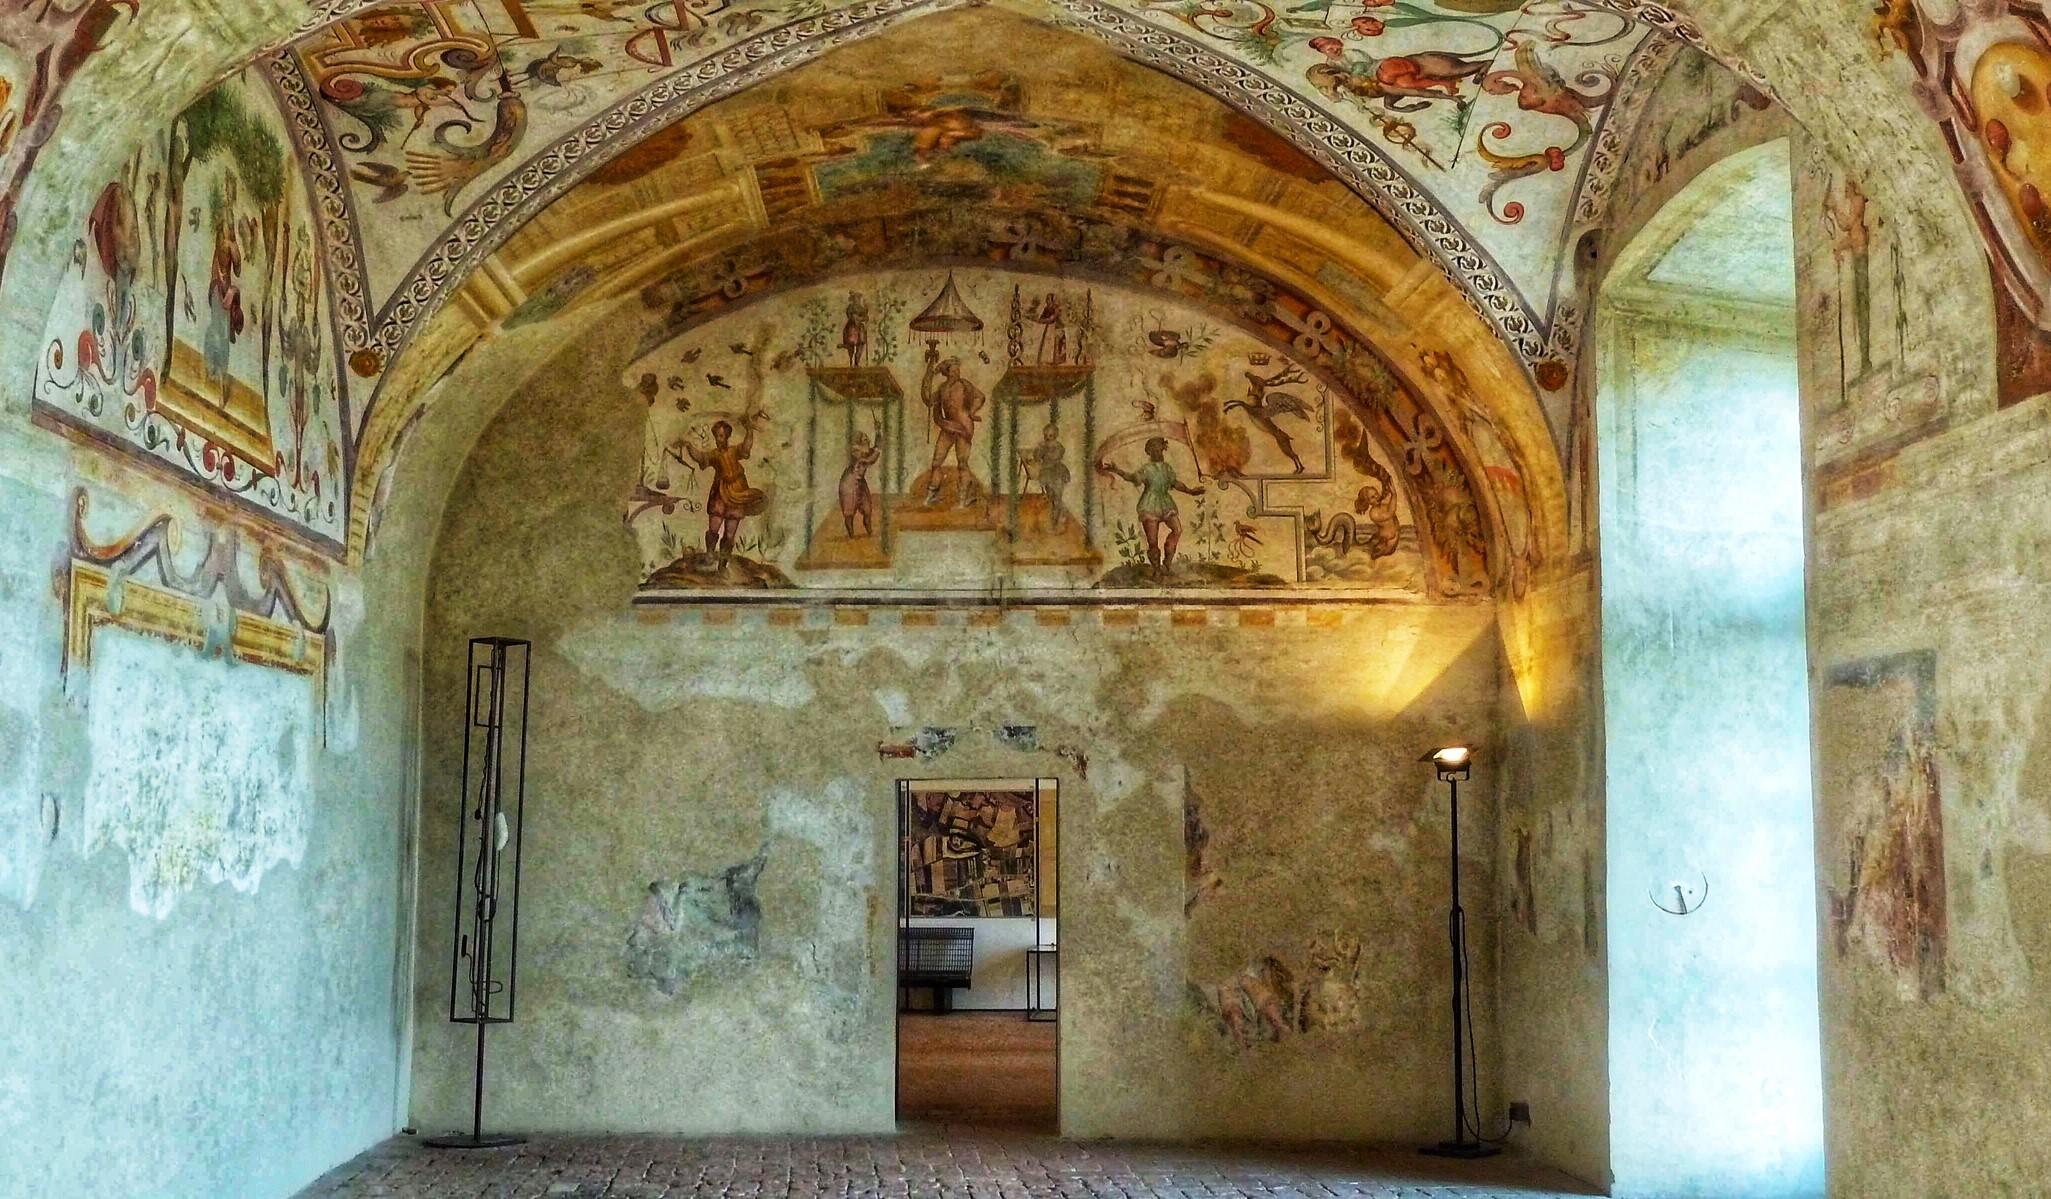 grottesche-al-castello-di-Torrechiara